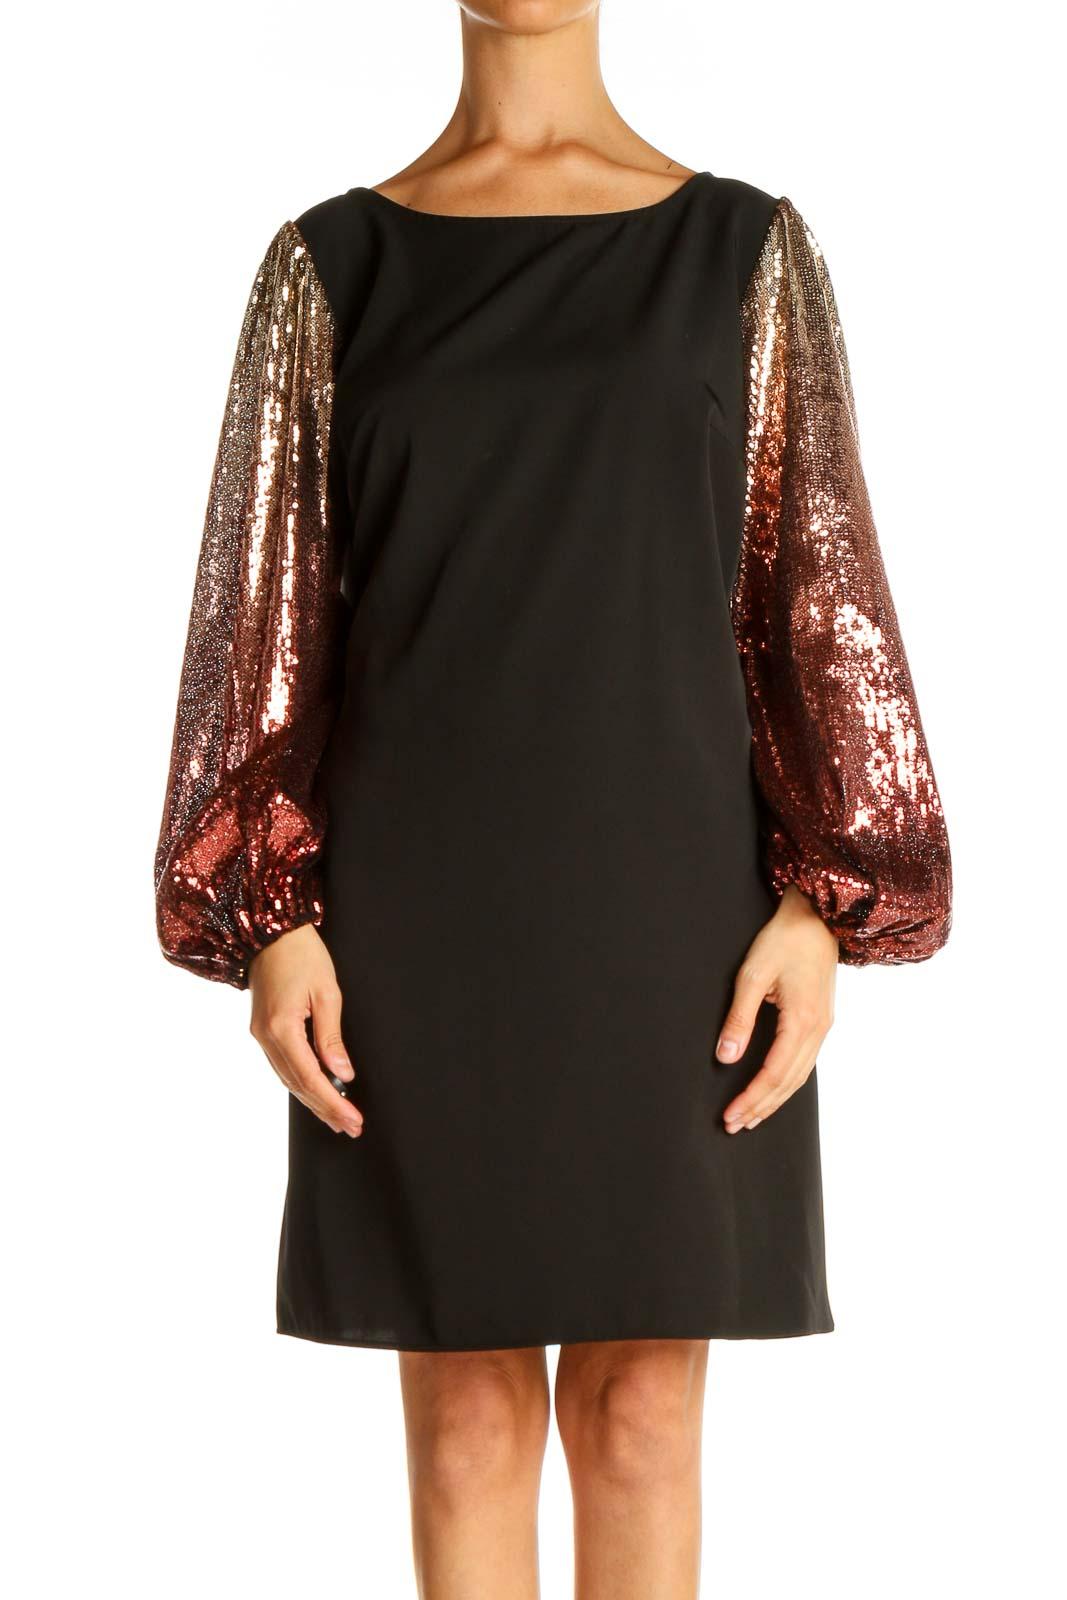 Black Sequin Cocktail Shift Dress Front